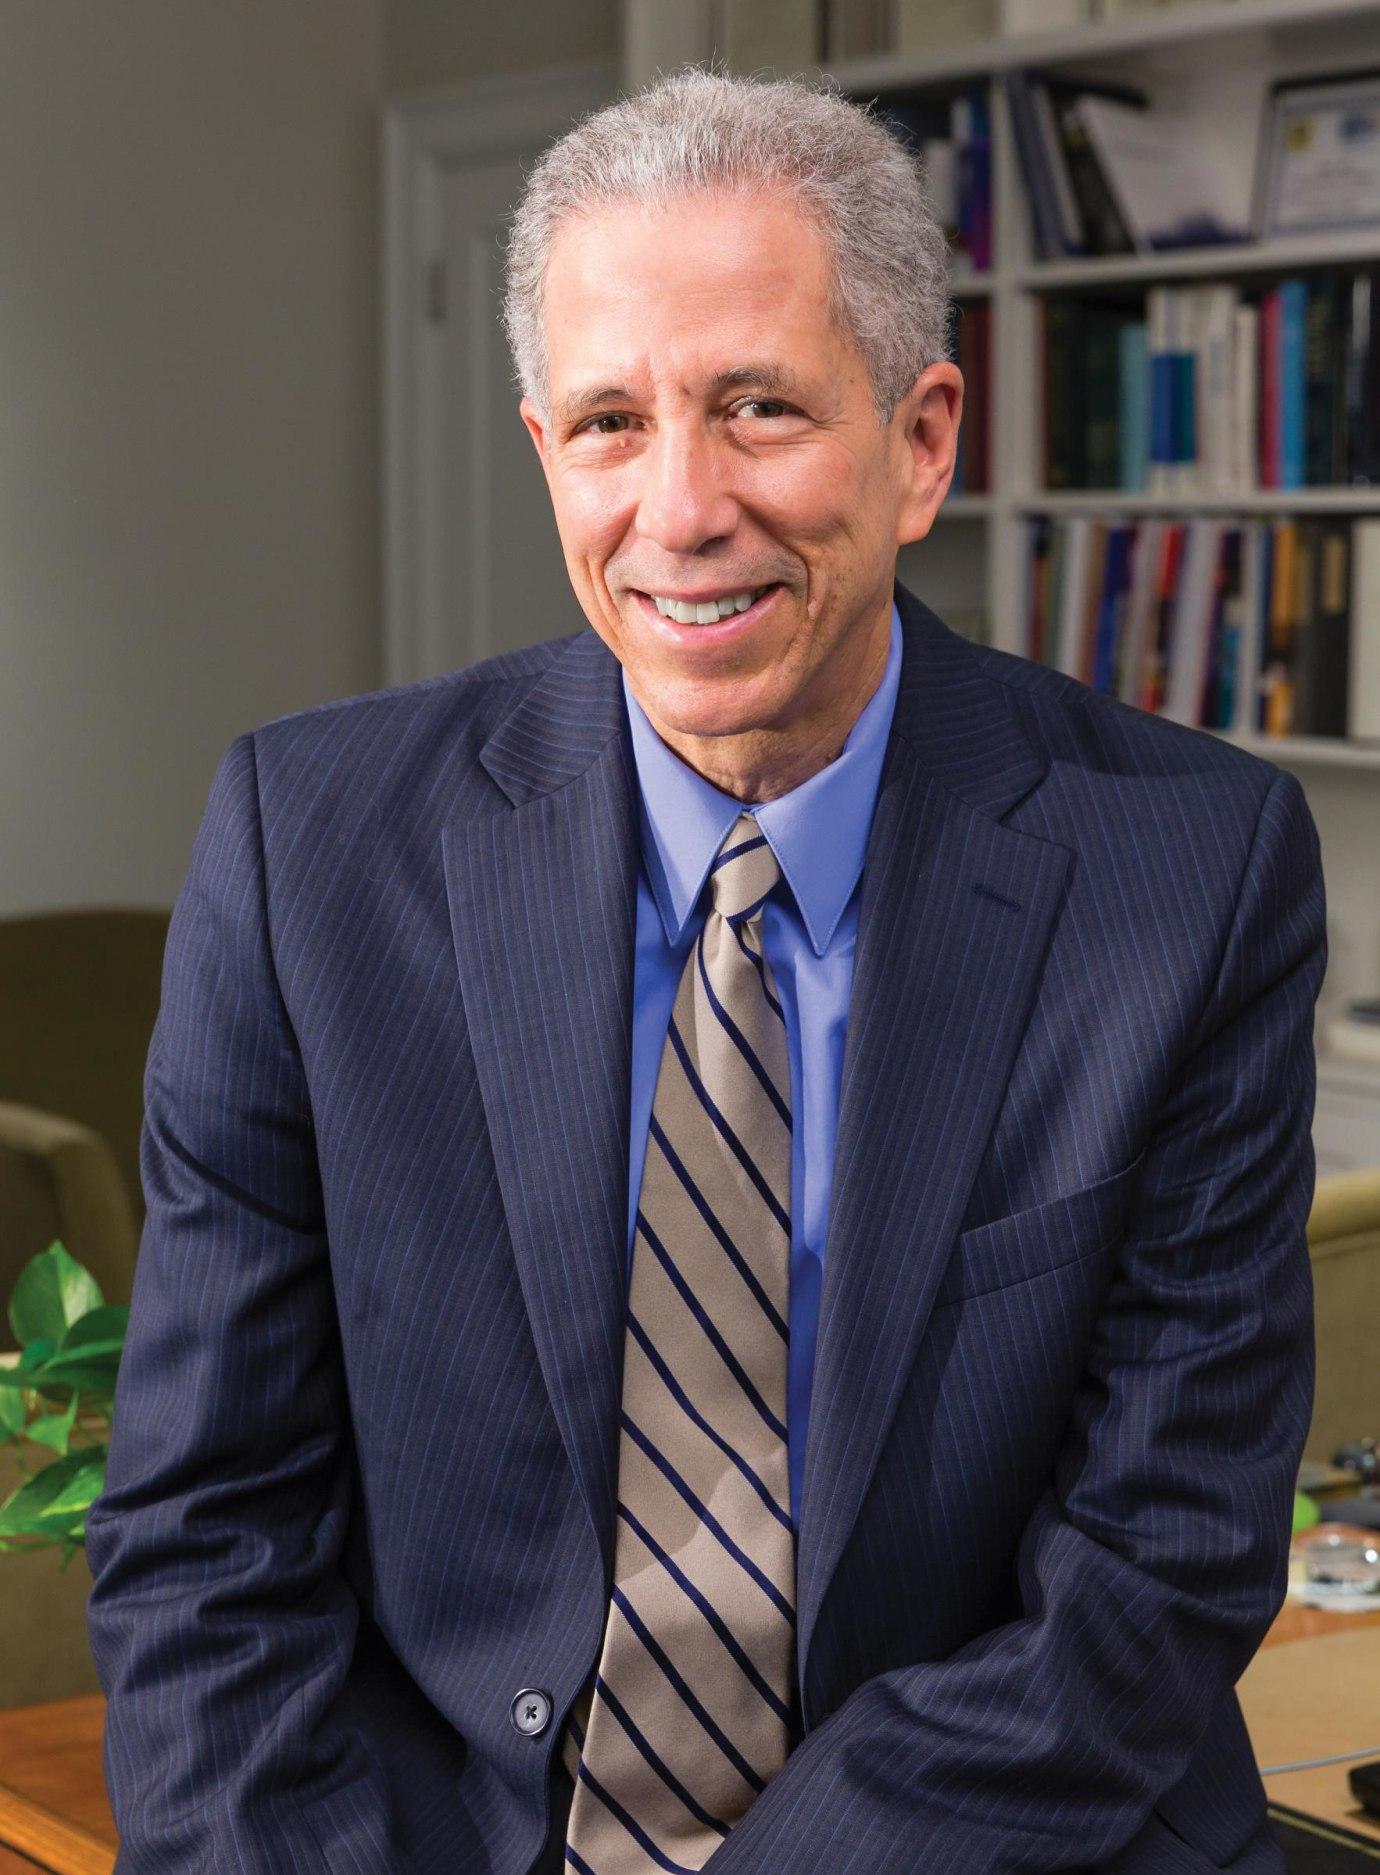 Robert Alpern, MD